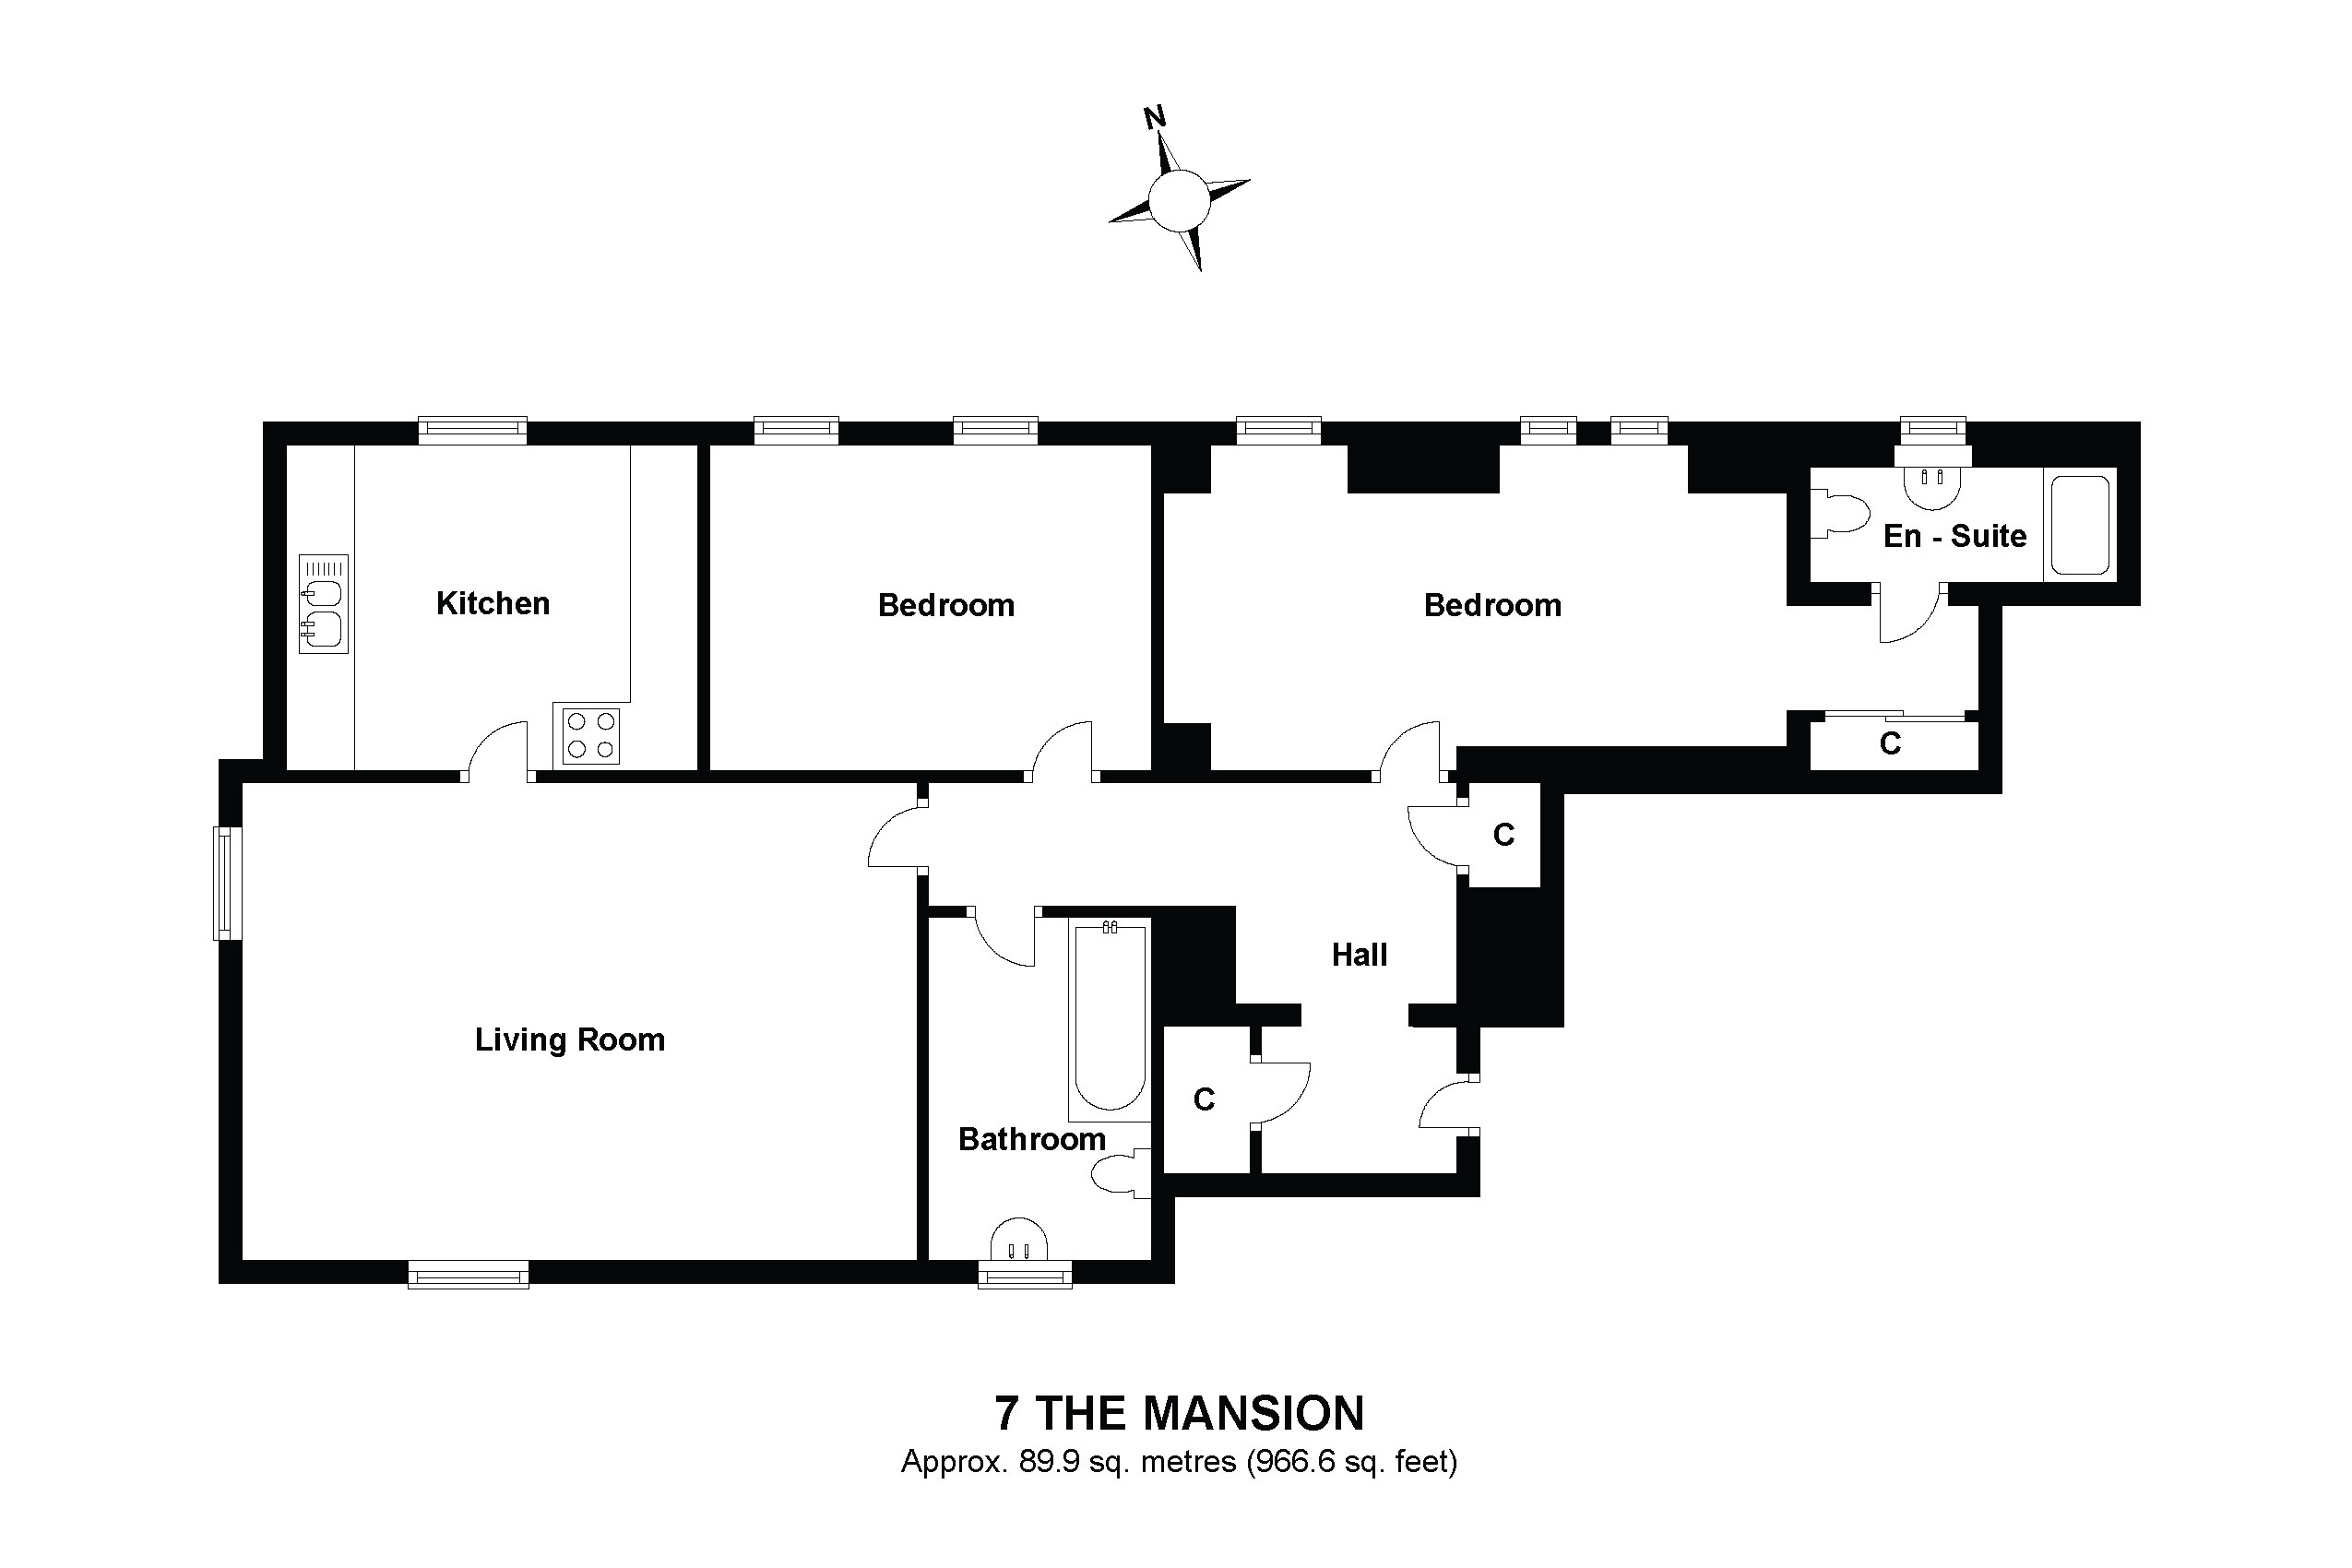 7 The Mansion Floorplan